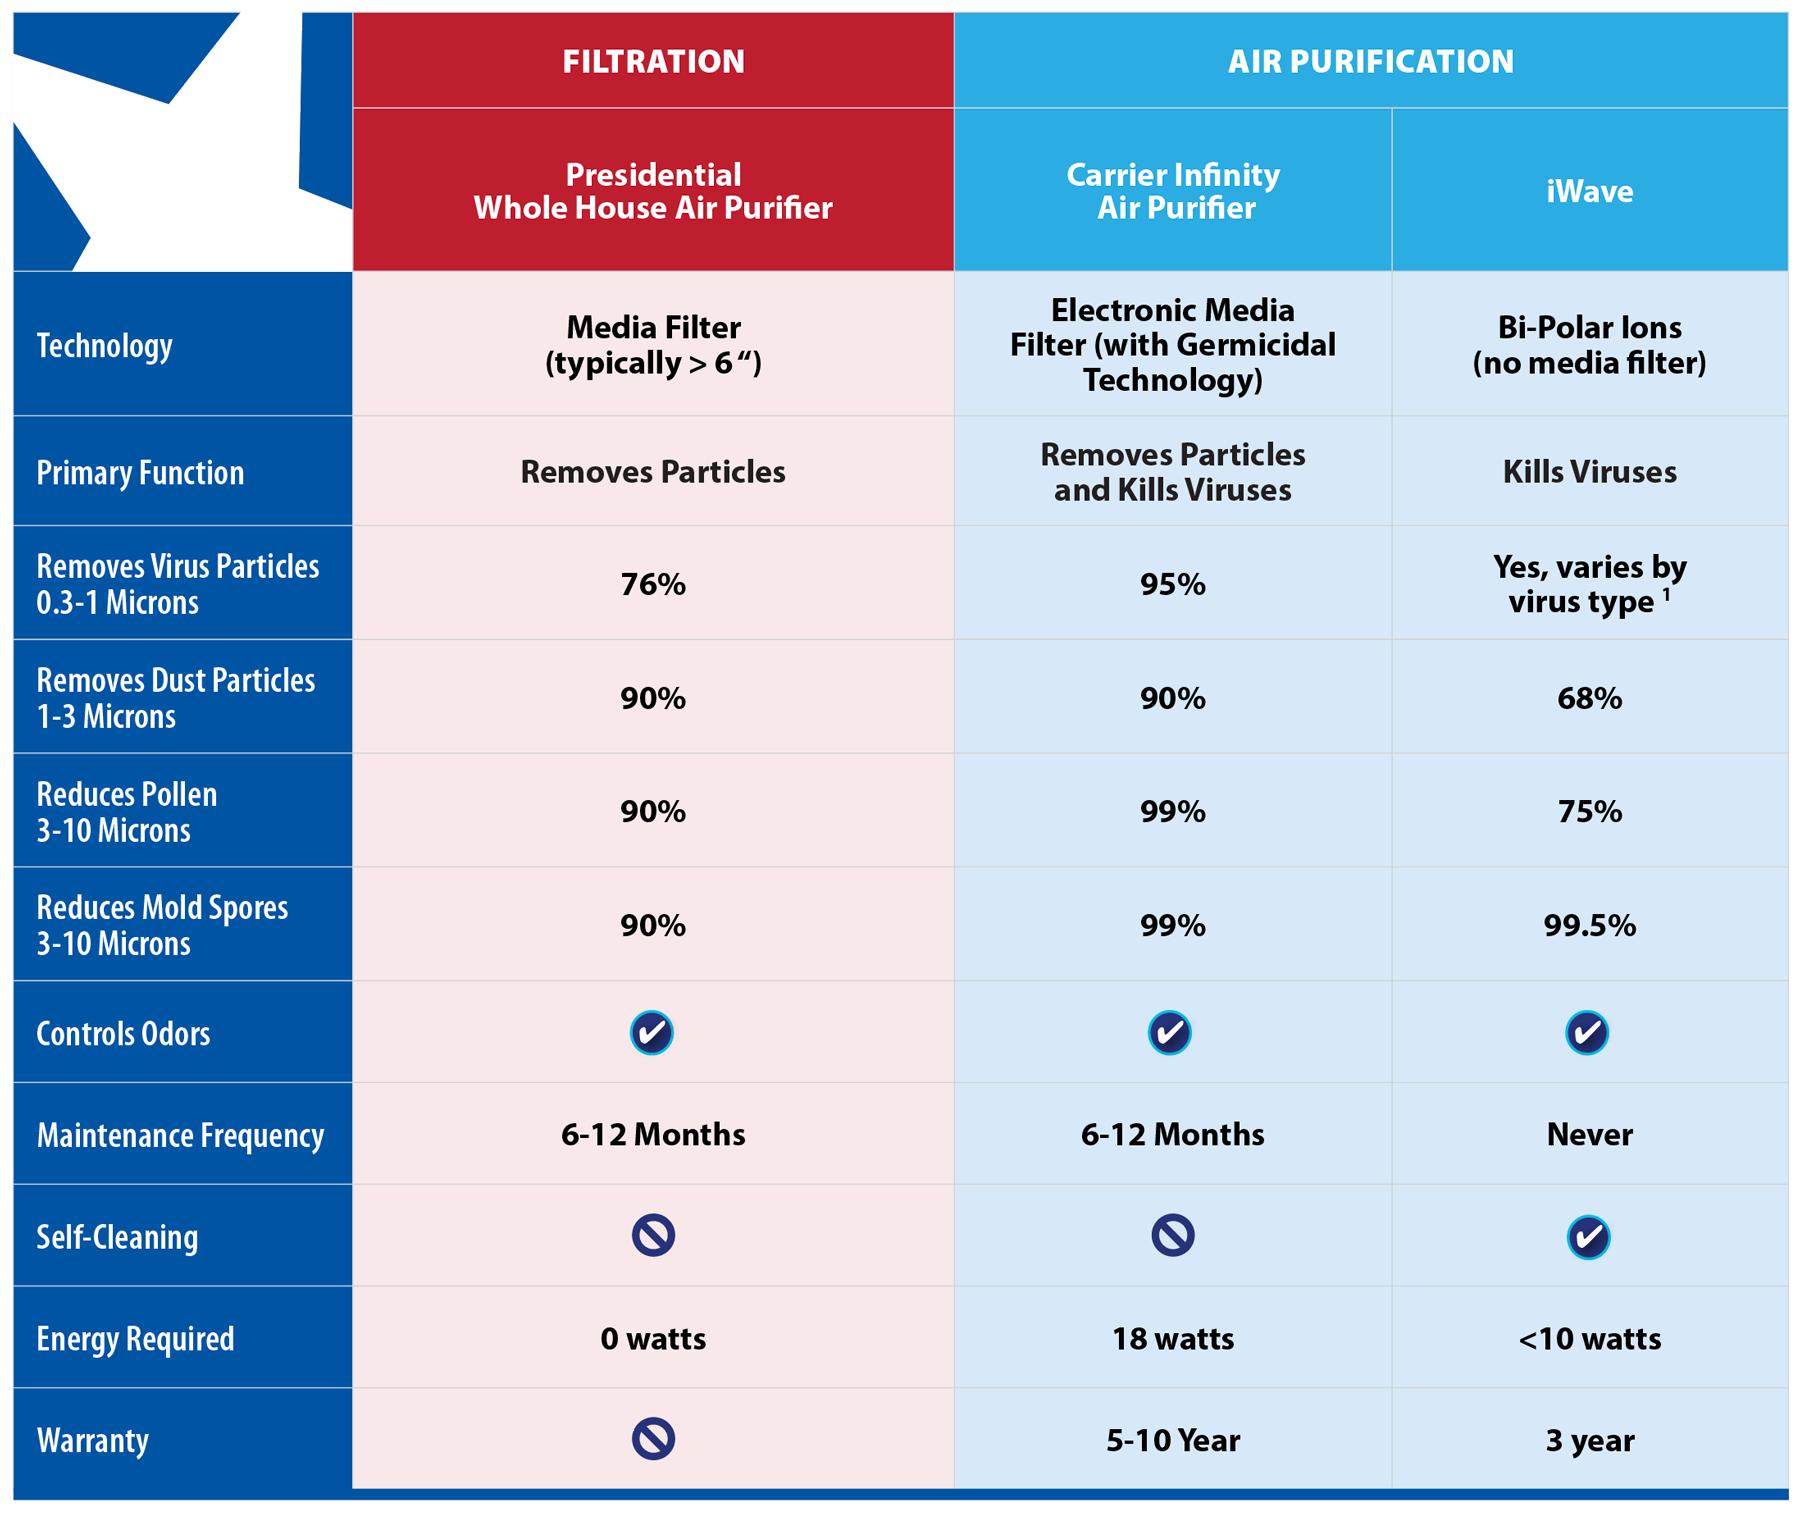 Air Purifier Comparison Chart